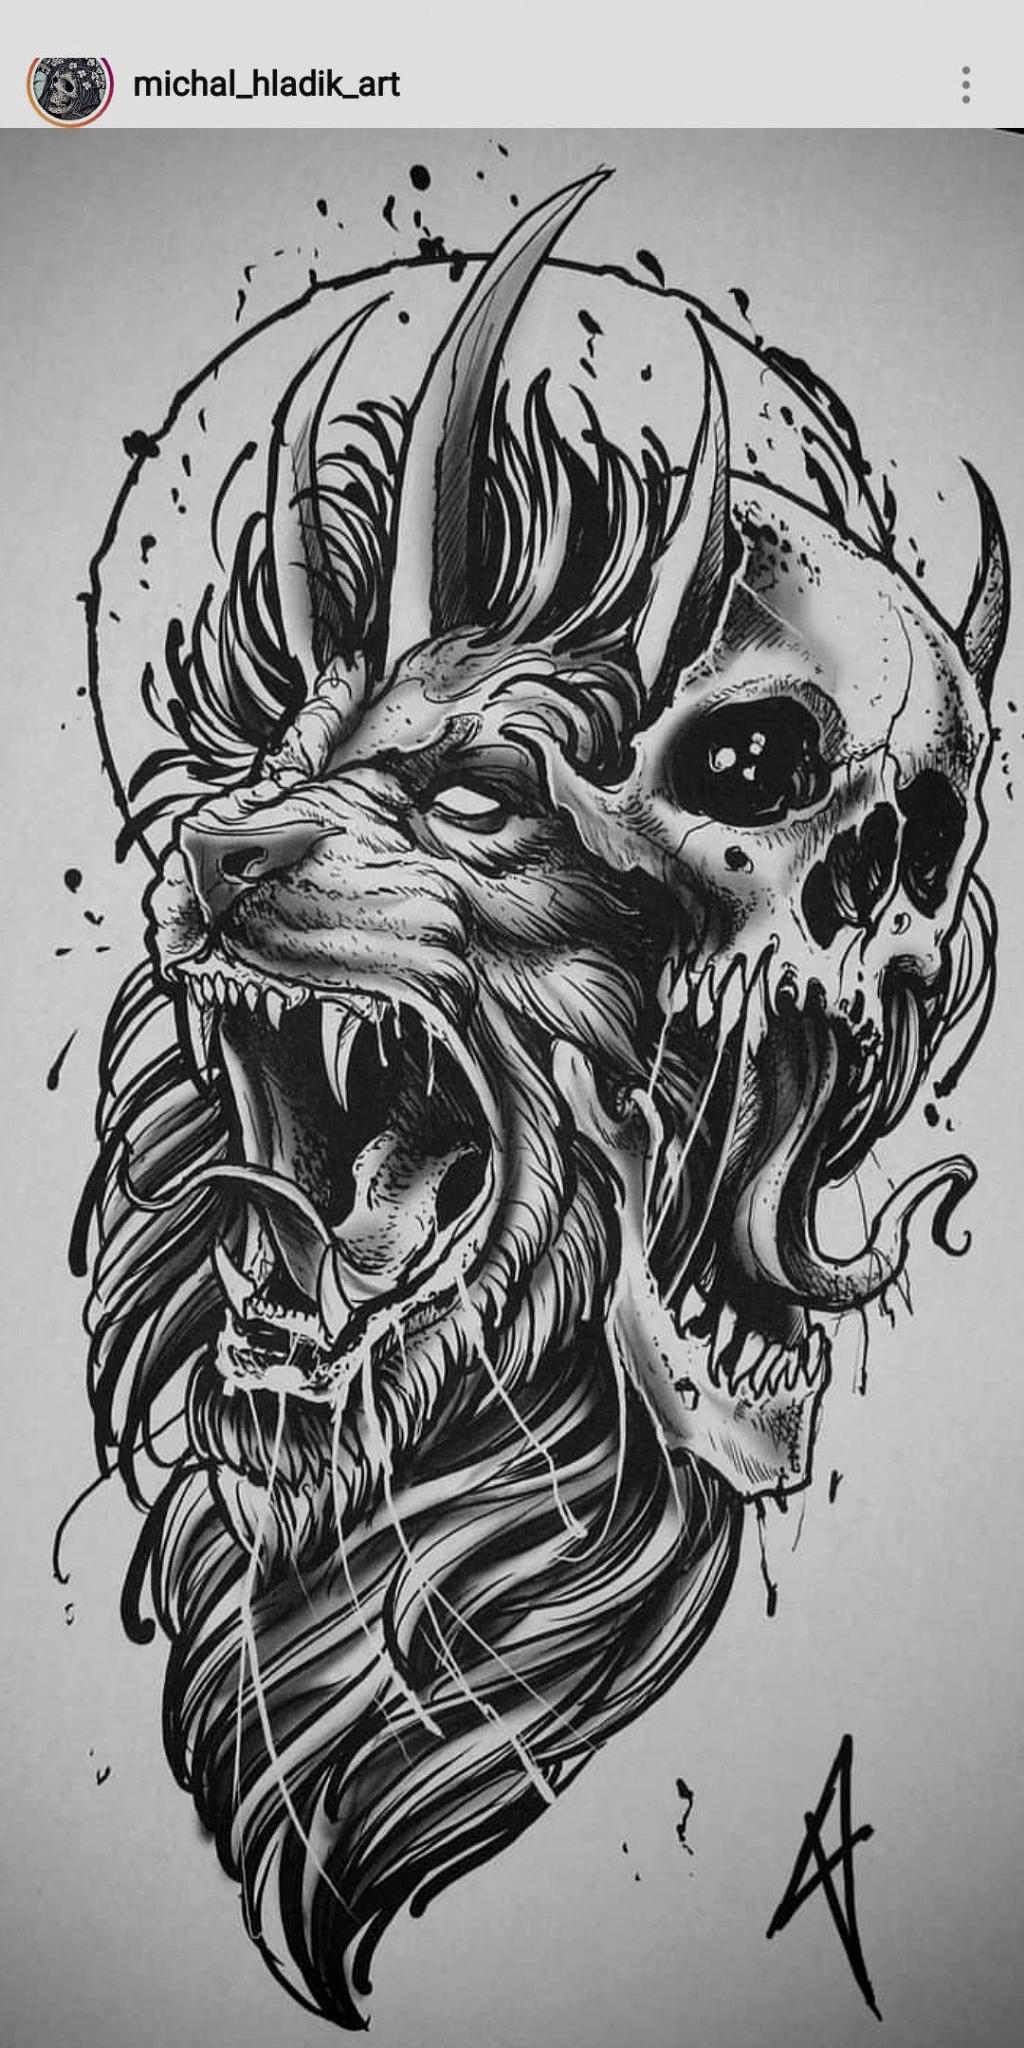 Randy Orton Tattoos Artist In 2020 Tattoo Style Drawings Tattoo Design Drawings Skull Tattoo Design